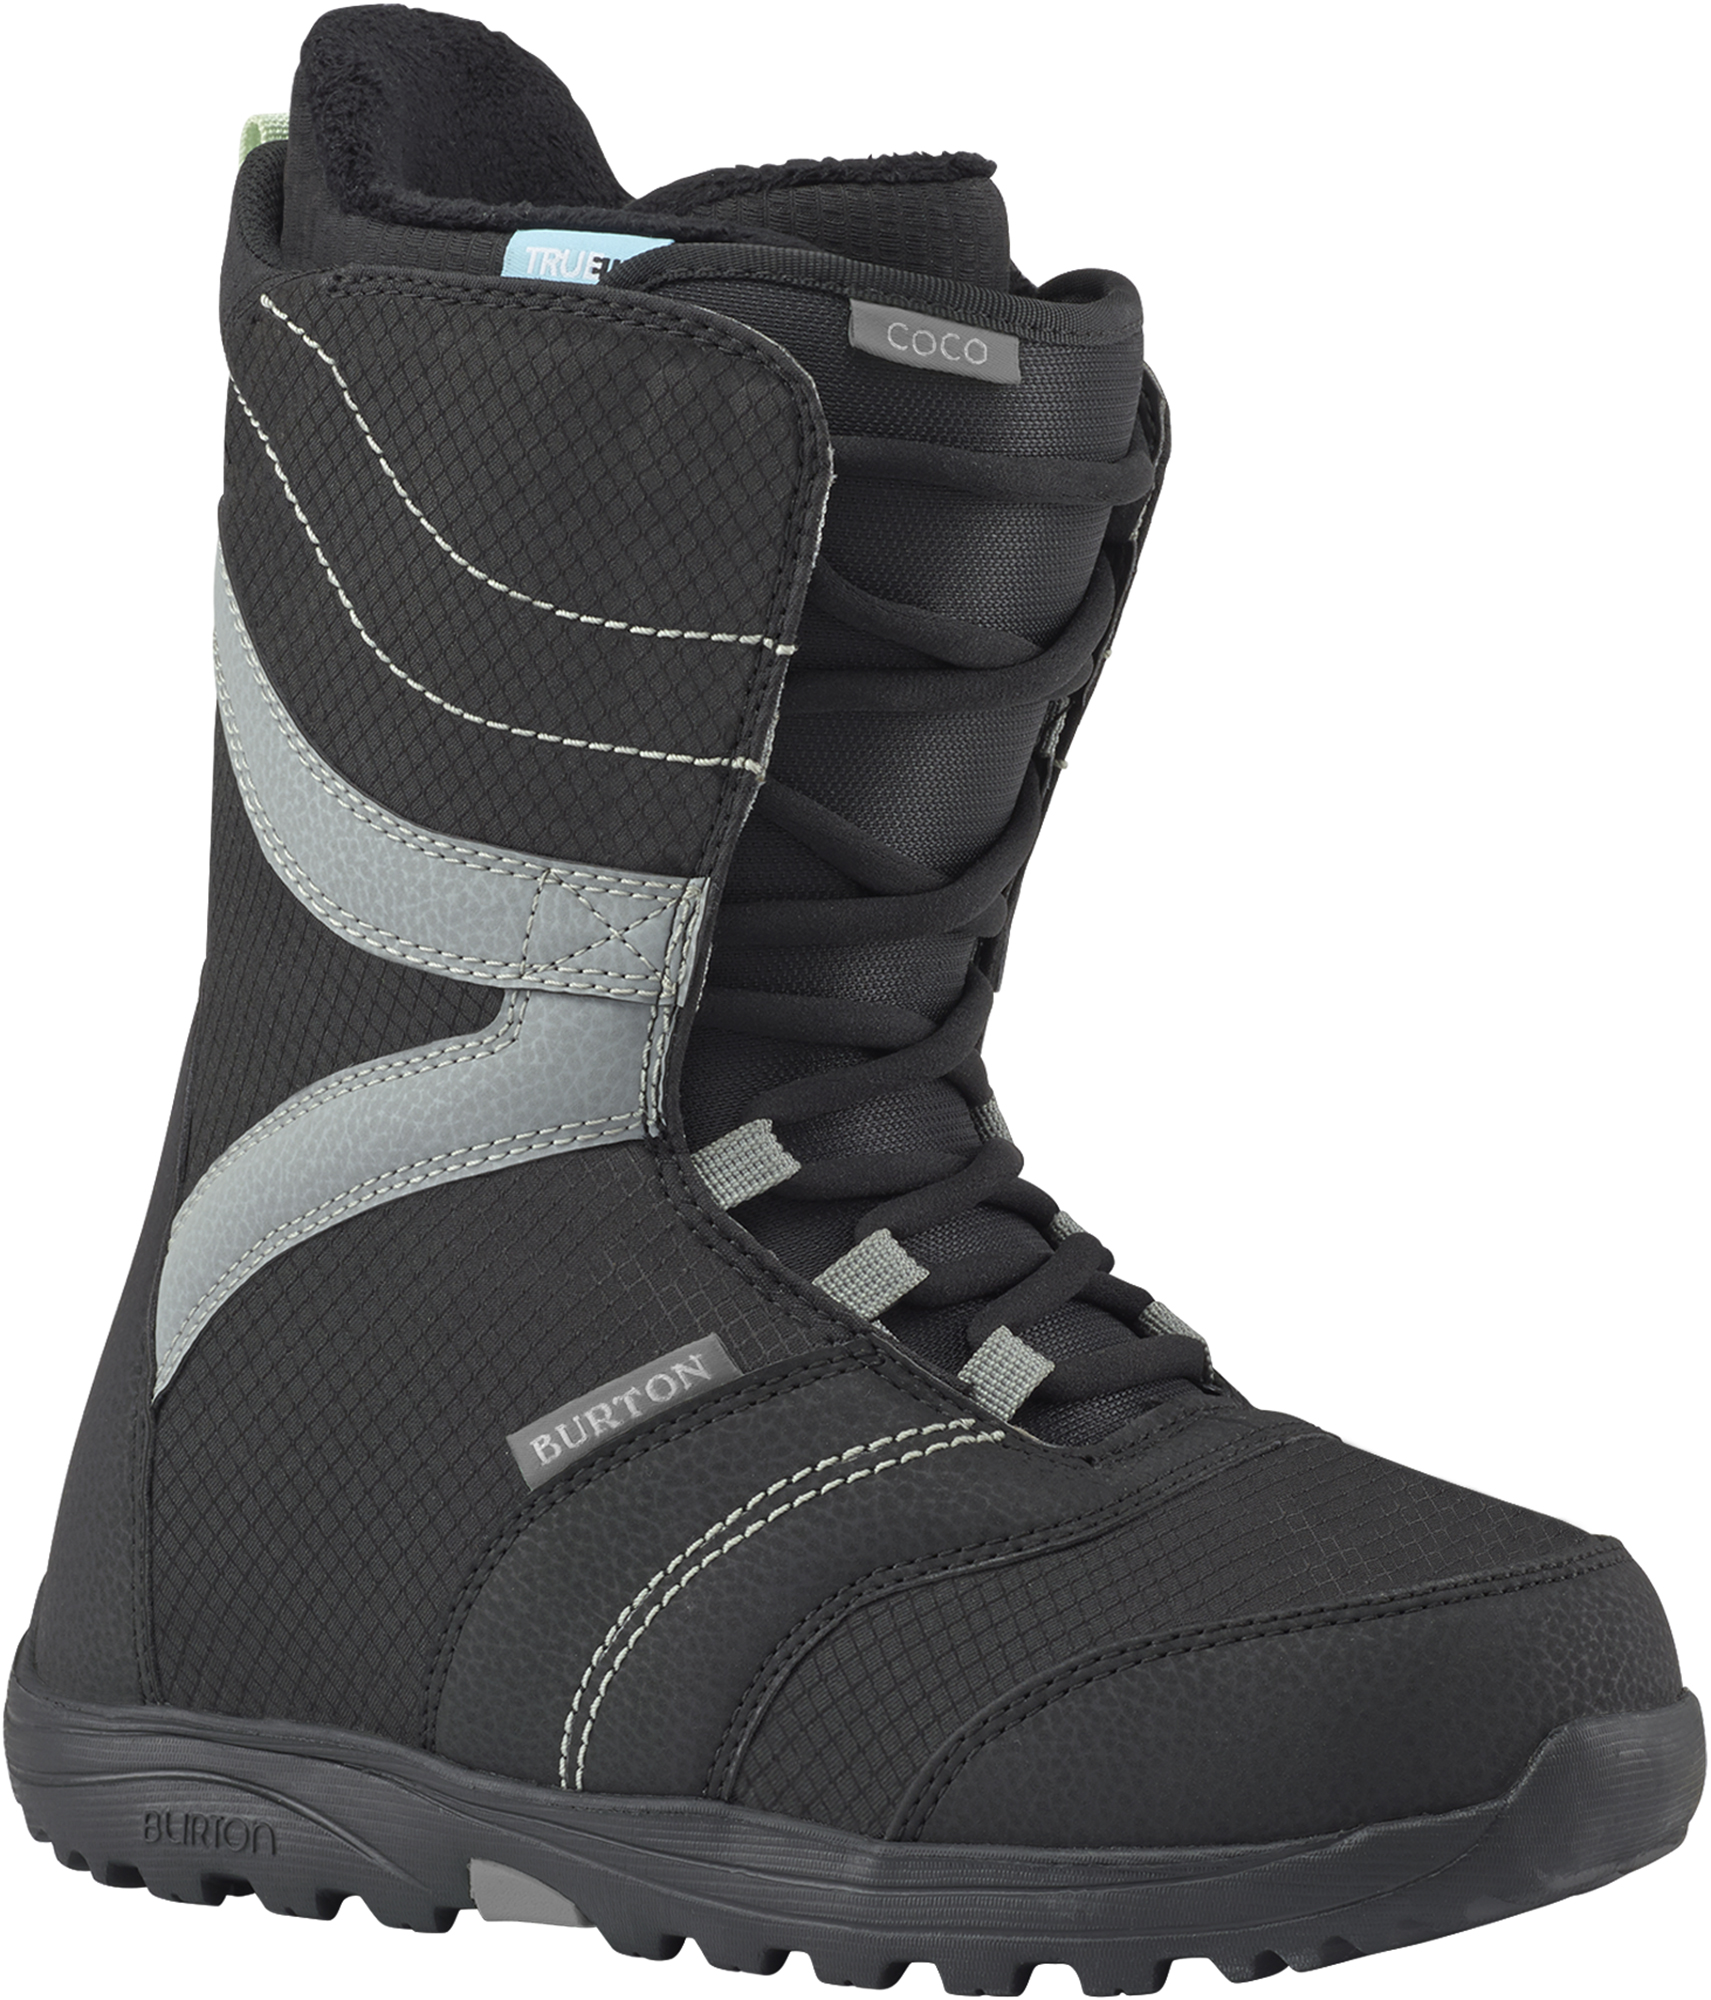 Burton Сноубордические ботинки женские Burton Coco, размер 38,5 брюки burton menswear london burton menswear london bu014emchoc6